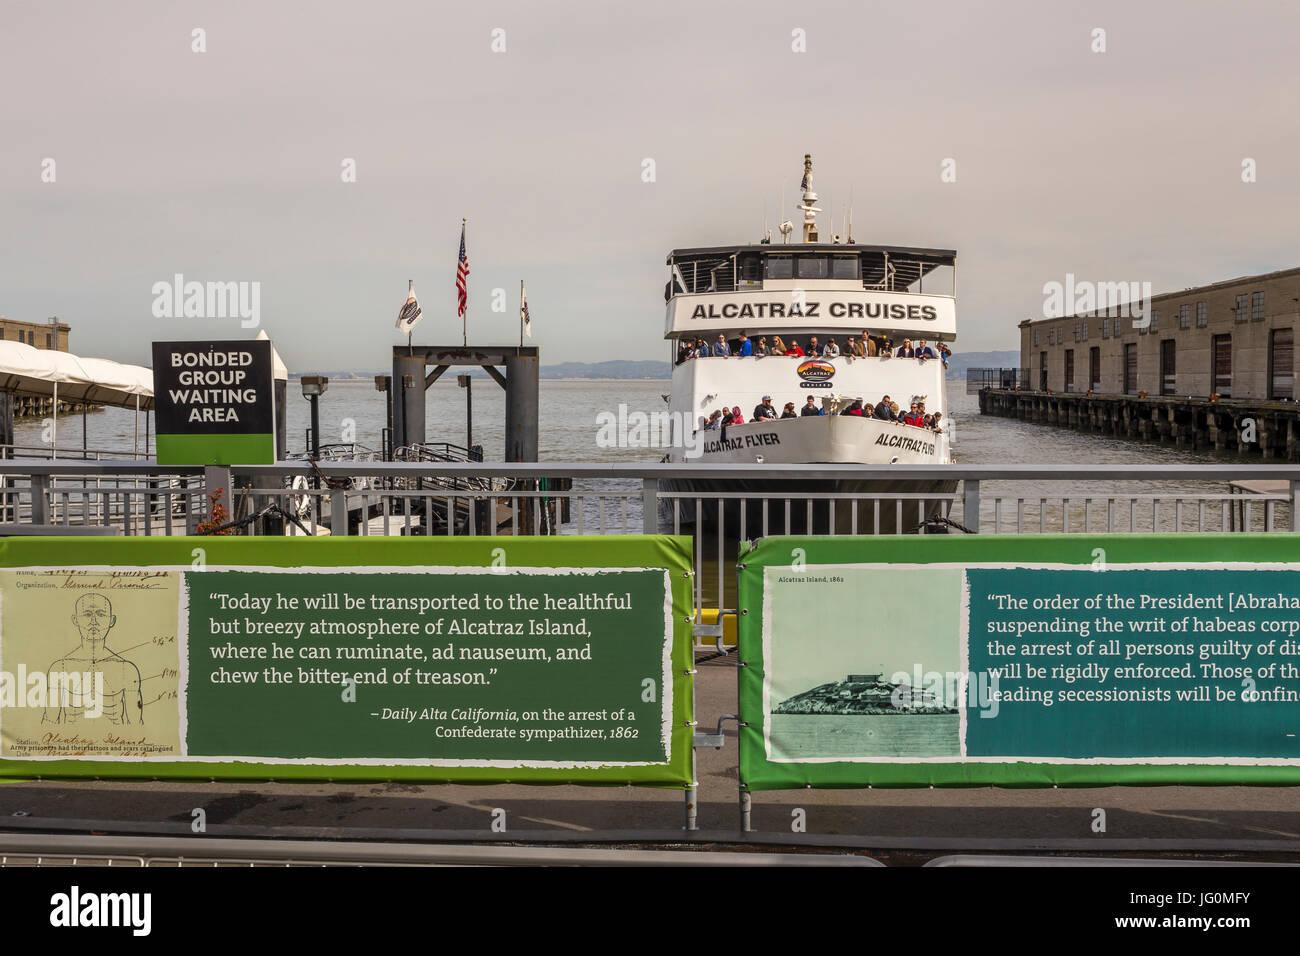 Alcatraz Cruises, Alcatraz ferry, ferry departure, Alcatraz Landing, Pier 33, The Embarcadero, San Francisco, California, - Stock Image